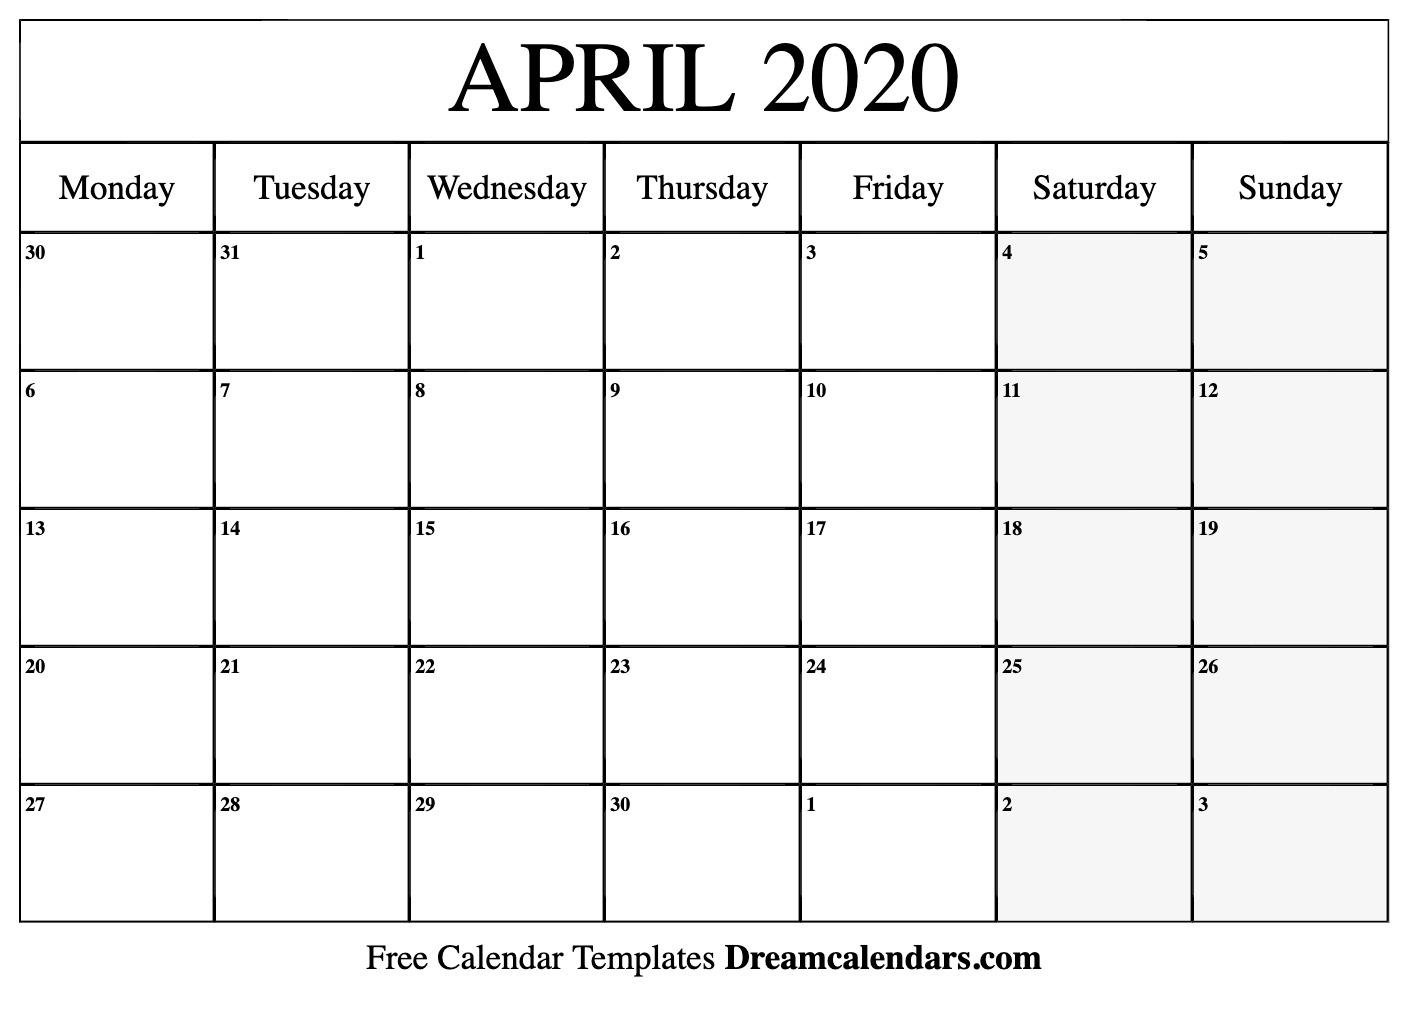 Printable April 2020 Calendar pertaining to 2020 Printable Calendar Free That Start With Monday